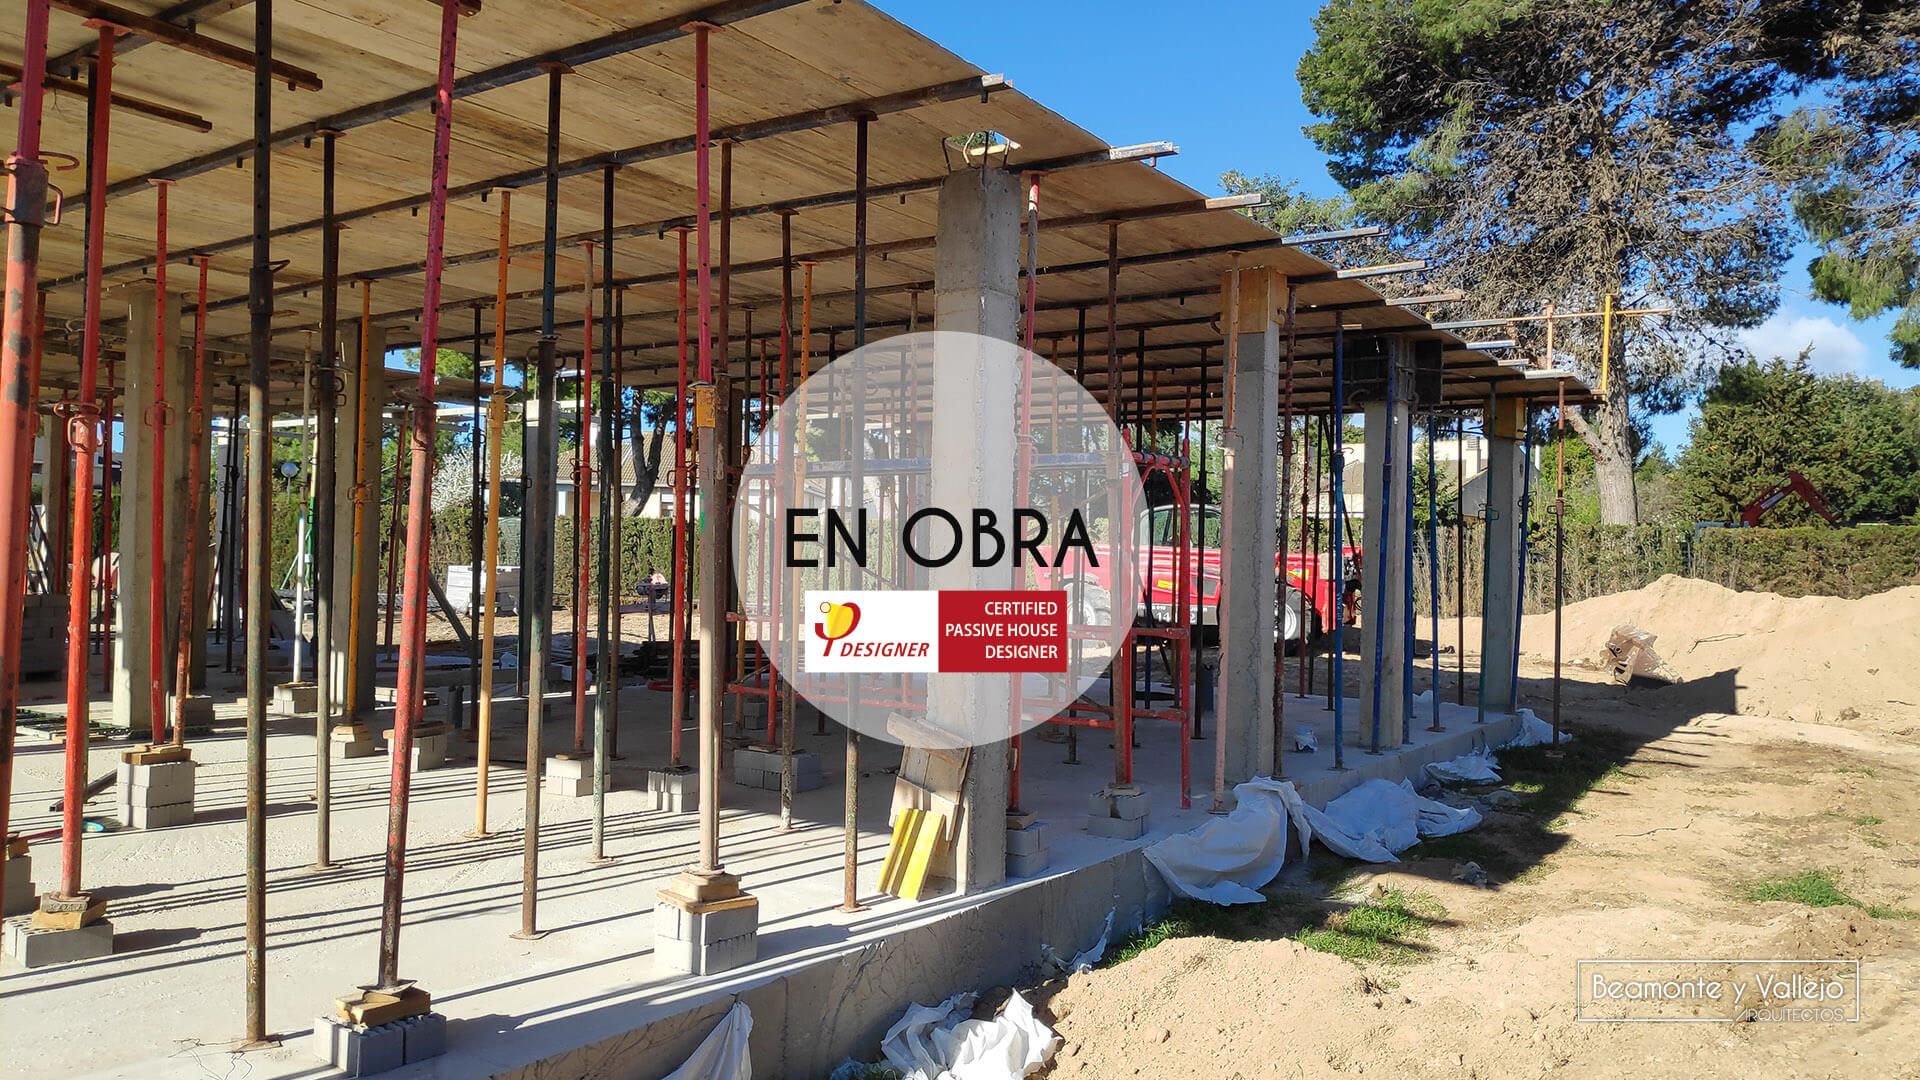 Beamonte y Vallejo arquitectos - Passivhaus El Zorongo II en obra - 02